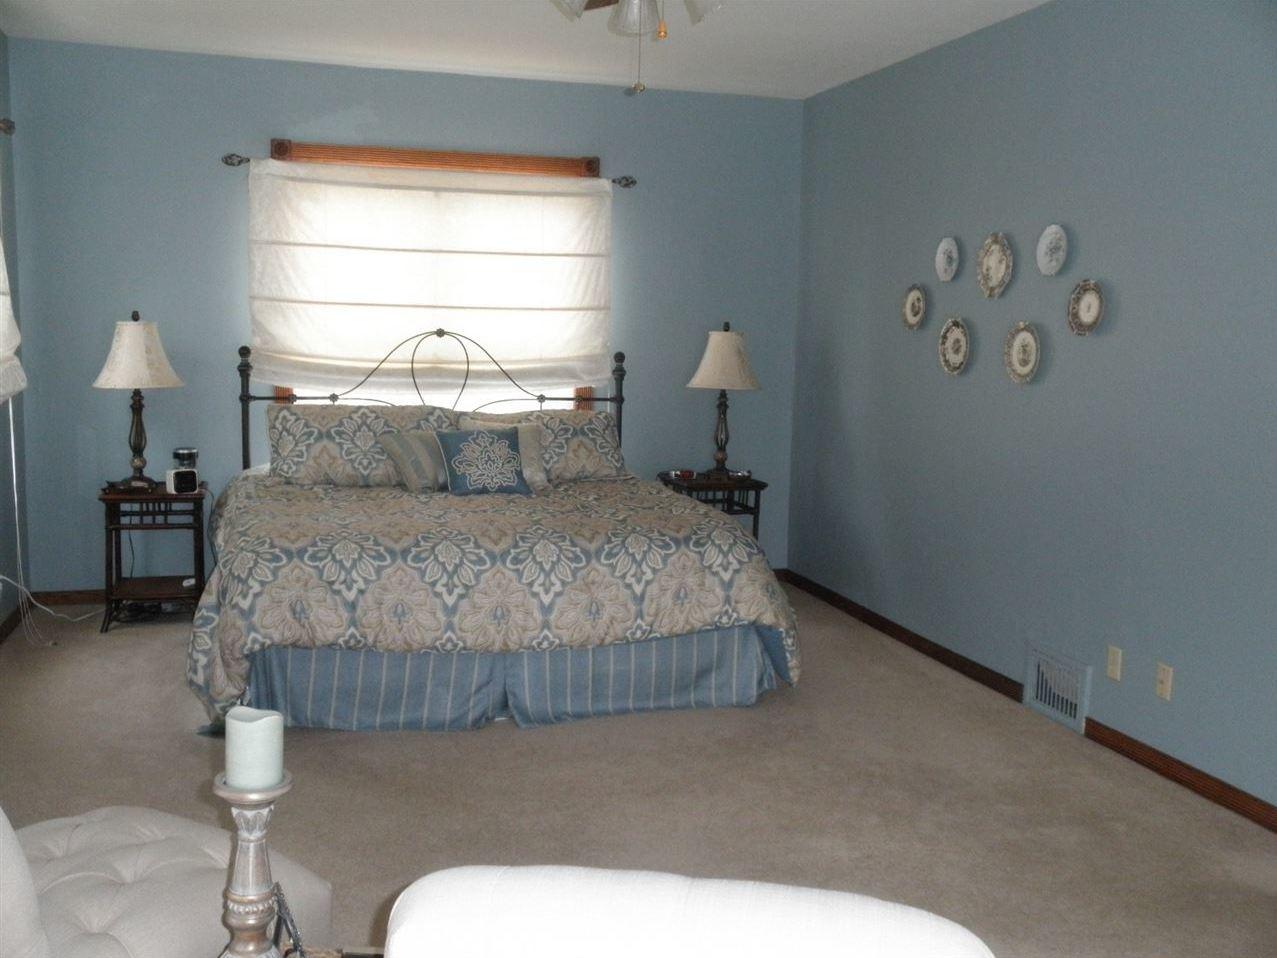 Sold Intraoffice W/MLS | 121 Elmwood  Ponca City, OK 74601 26